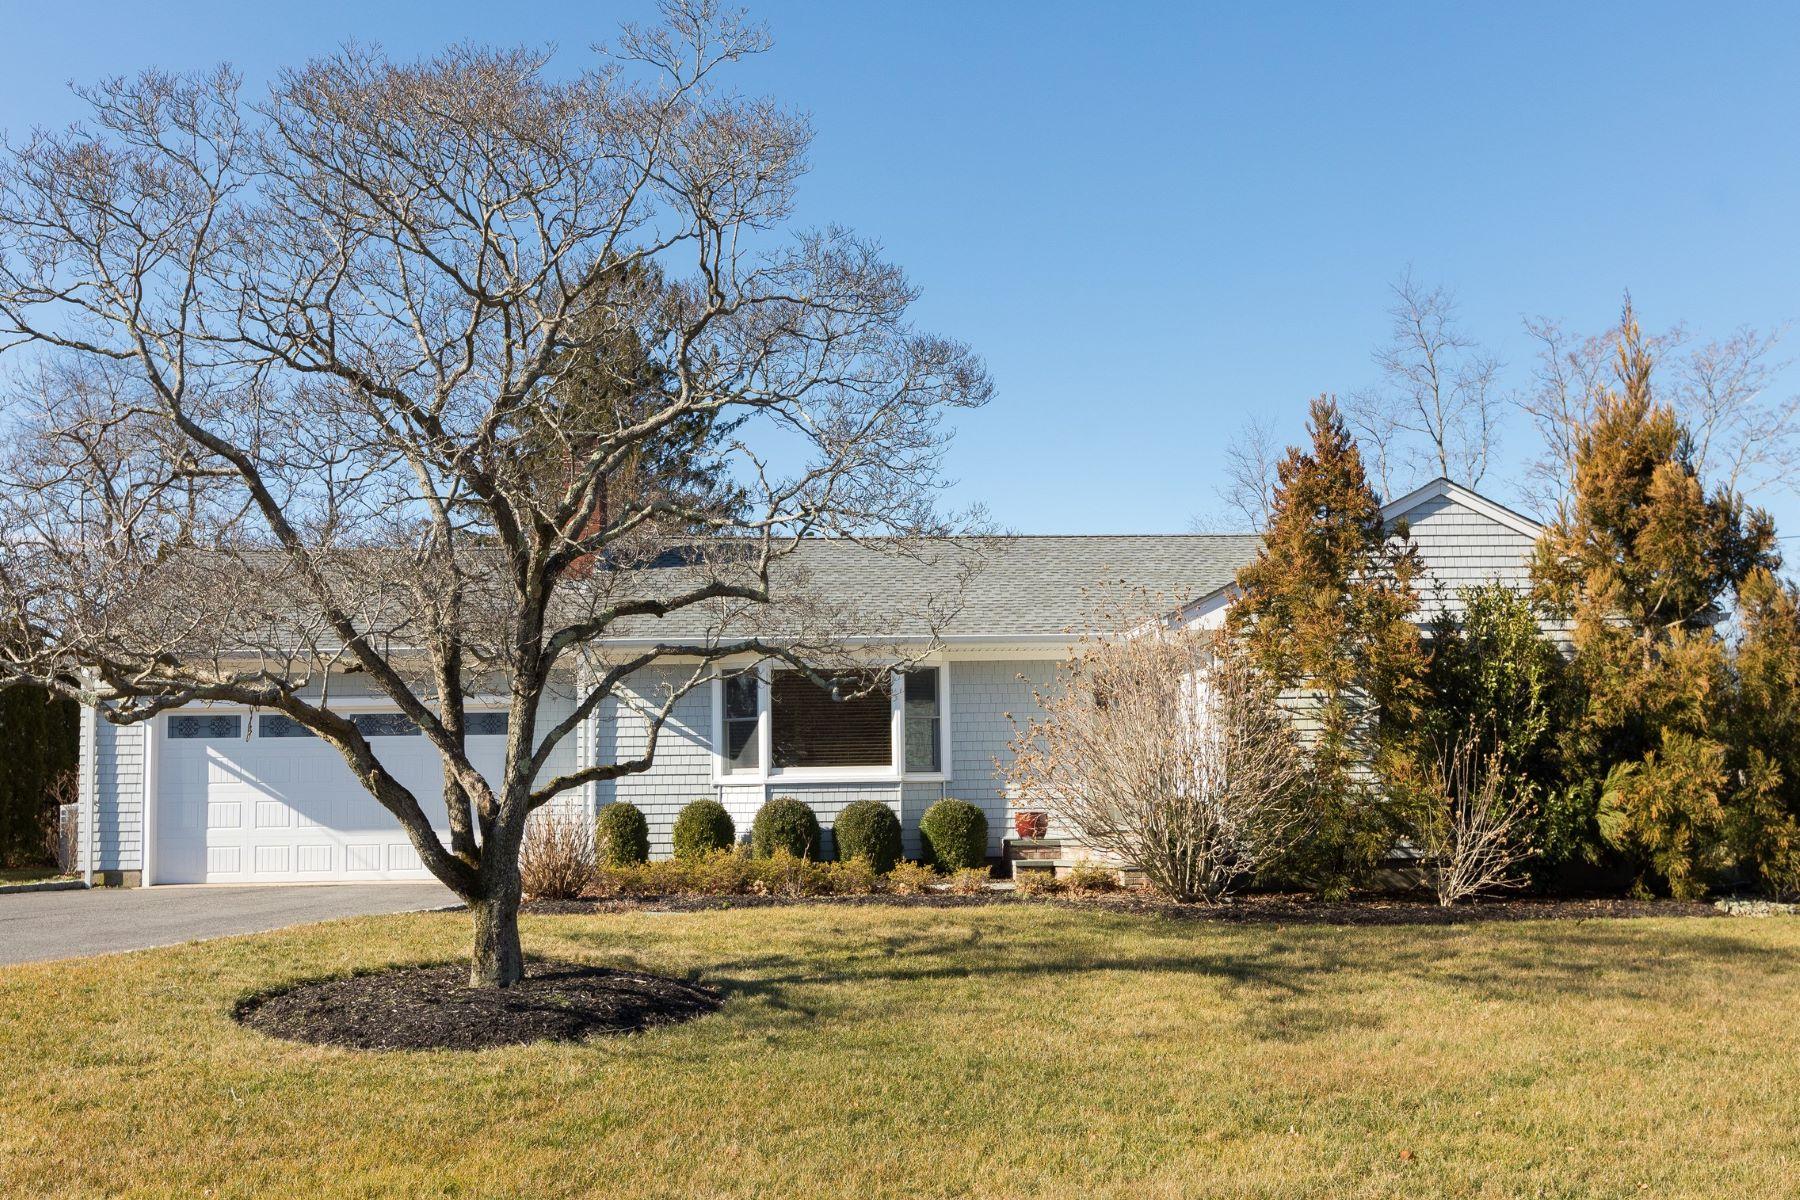 Single Family Homes for Sale at Mattituck 150 Meadow Lane Mattituck, New York 11952 United States